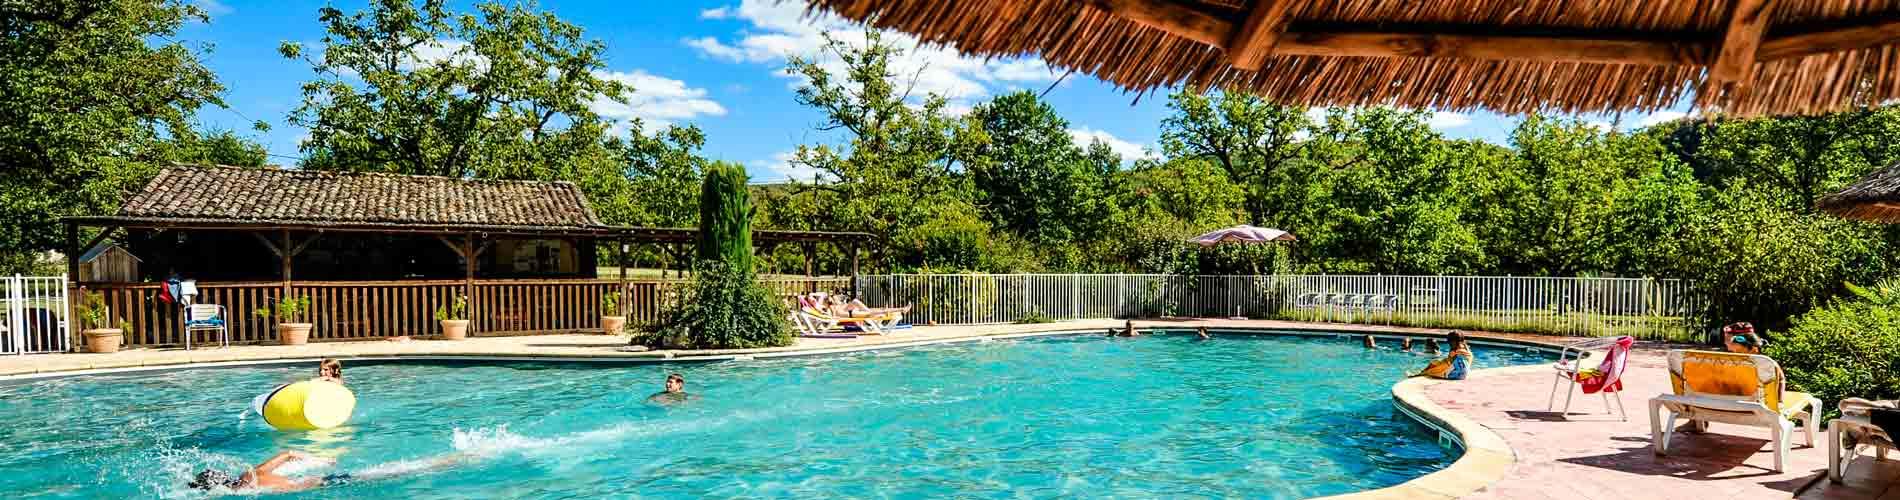 Camping lot avec piscine camping avec espace quatique for Camping queyras avec piscine